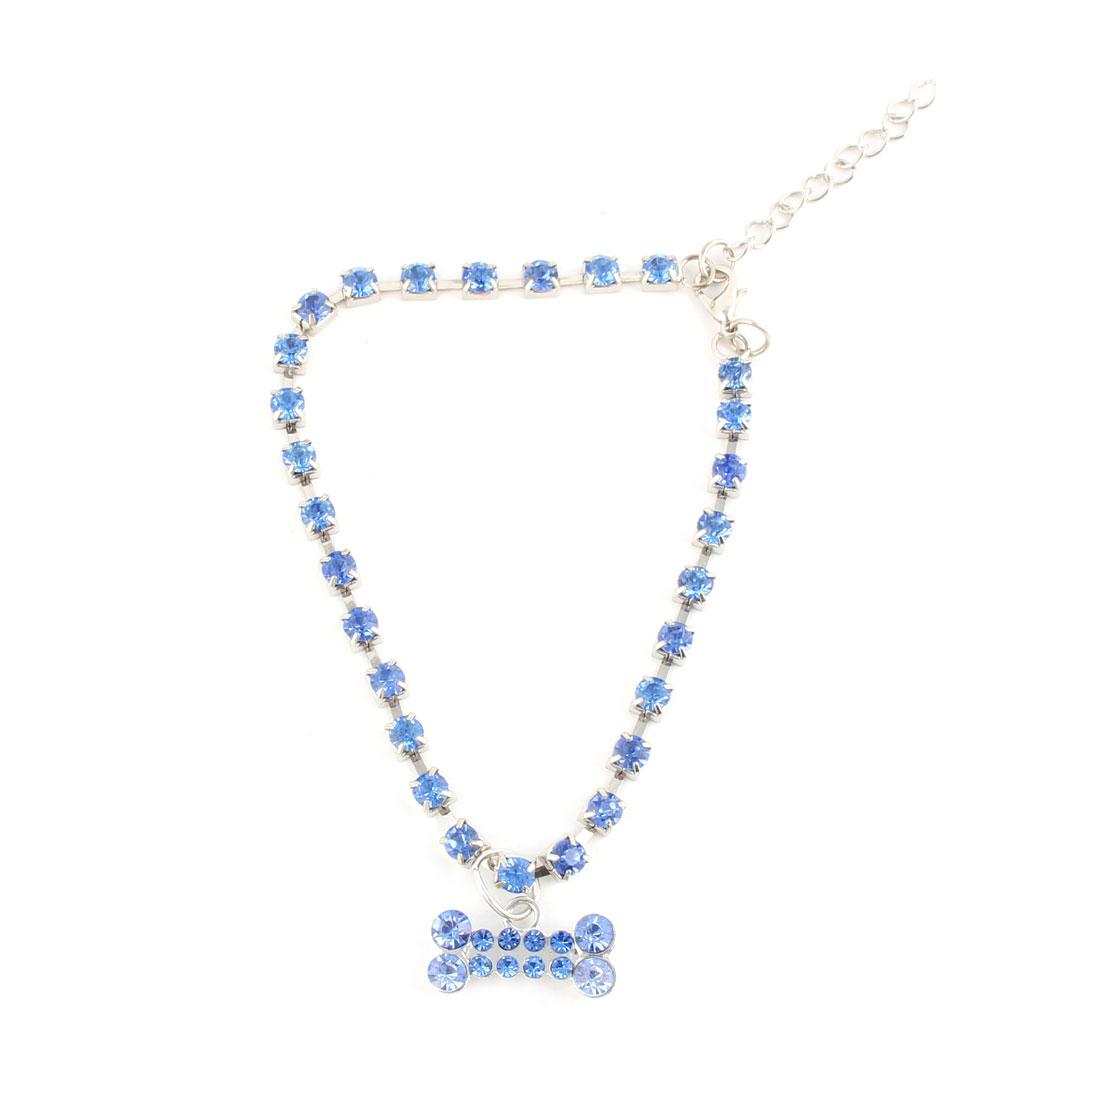 Pet Dog Bone Pattern Pendant Rhinestone Inlaid Decorative Necklace Neck Chain Blue